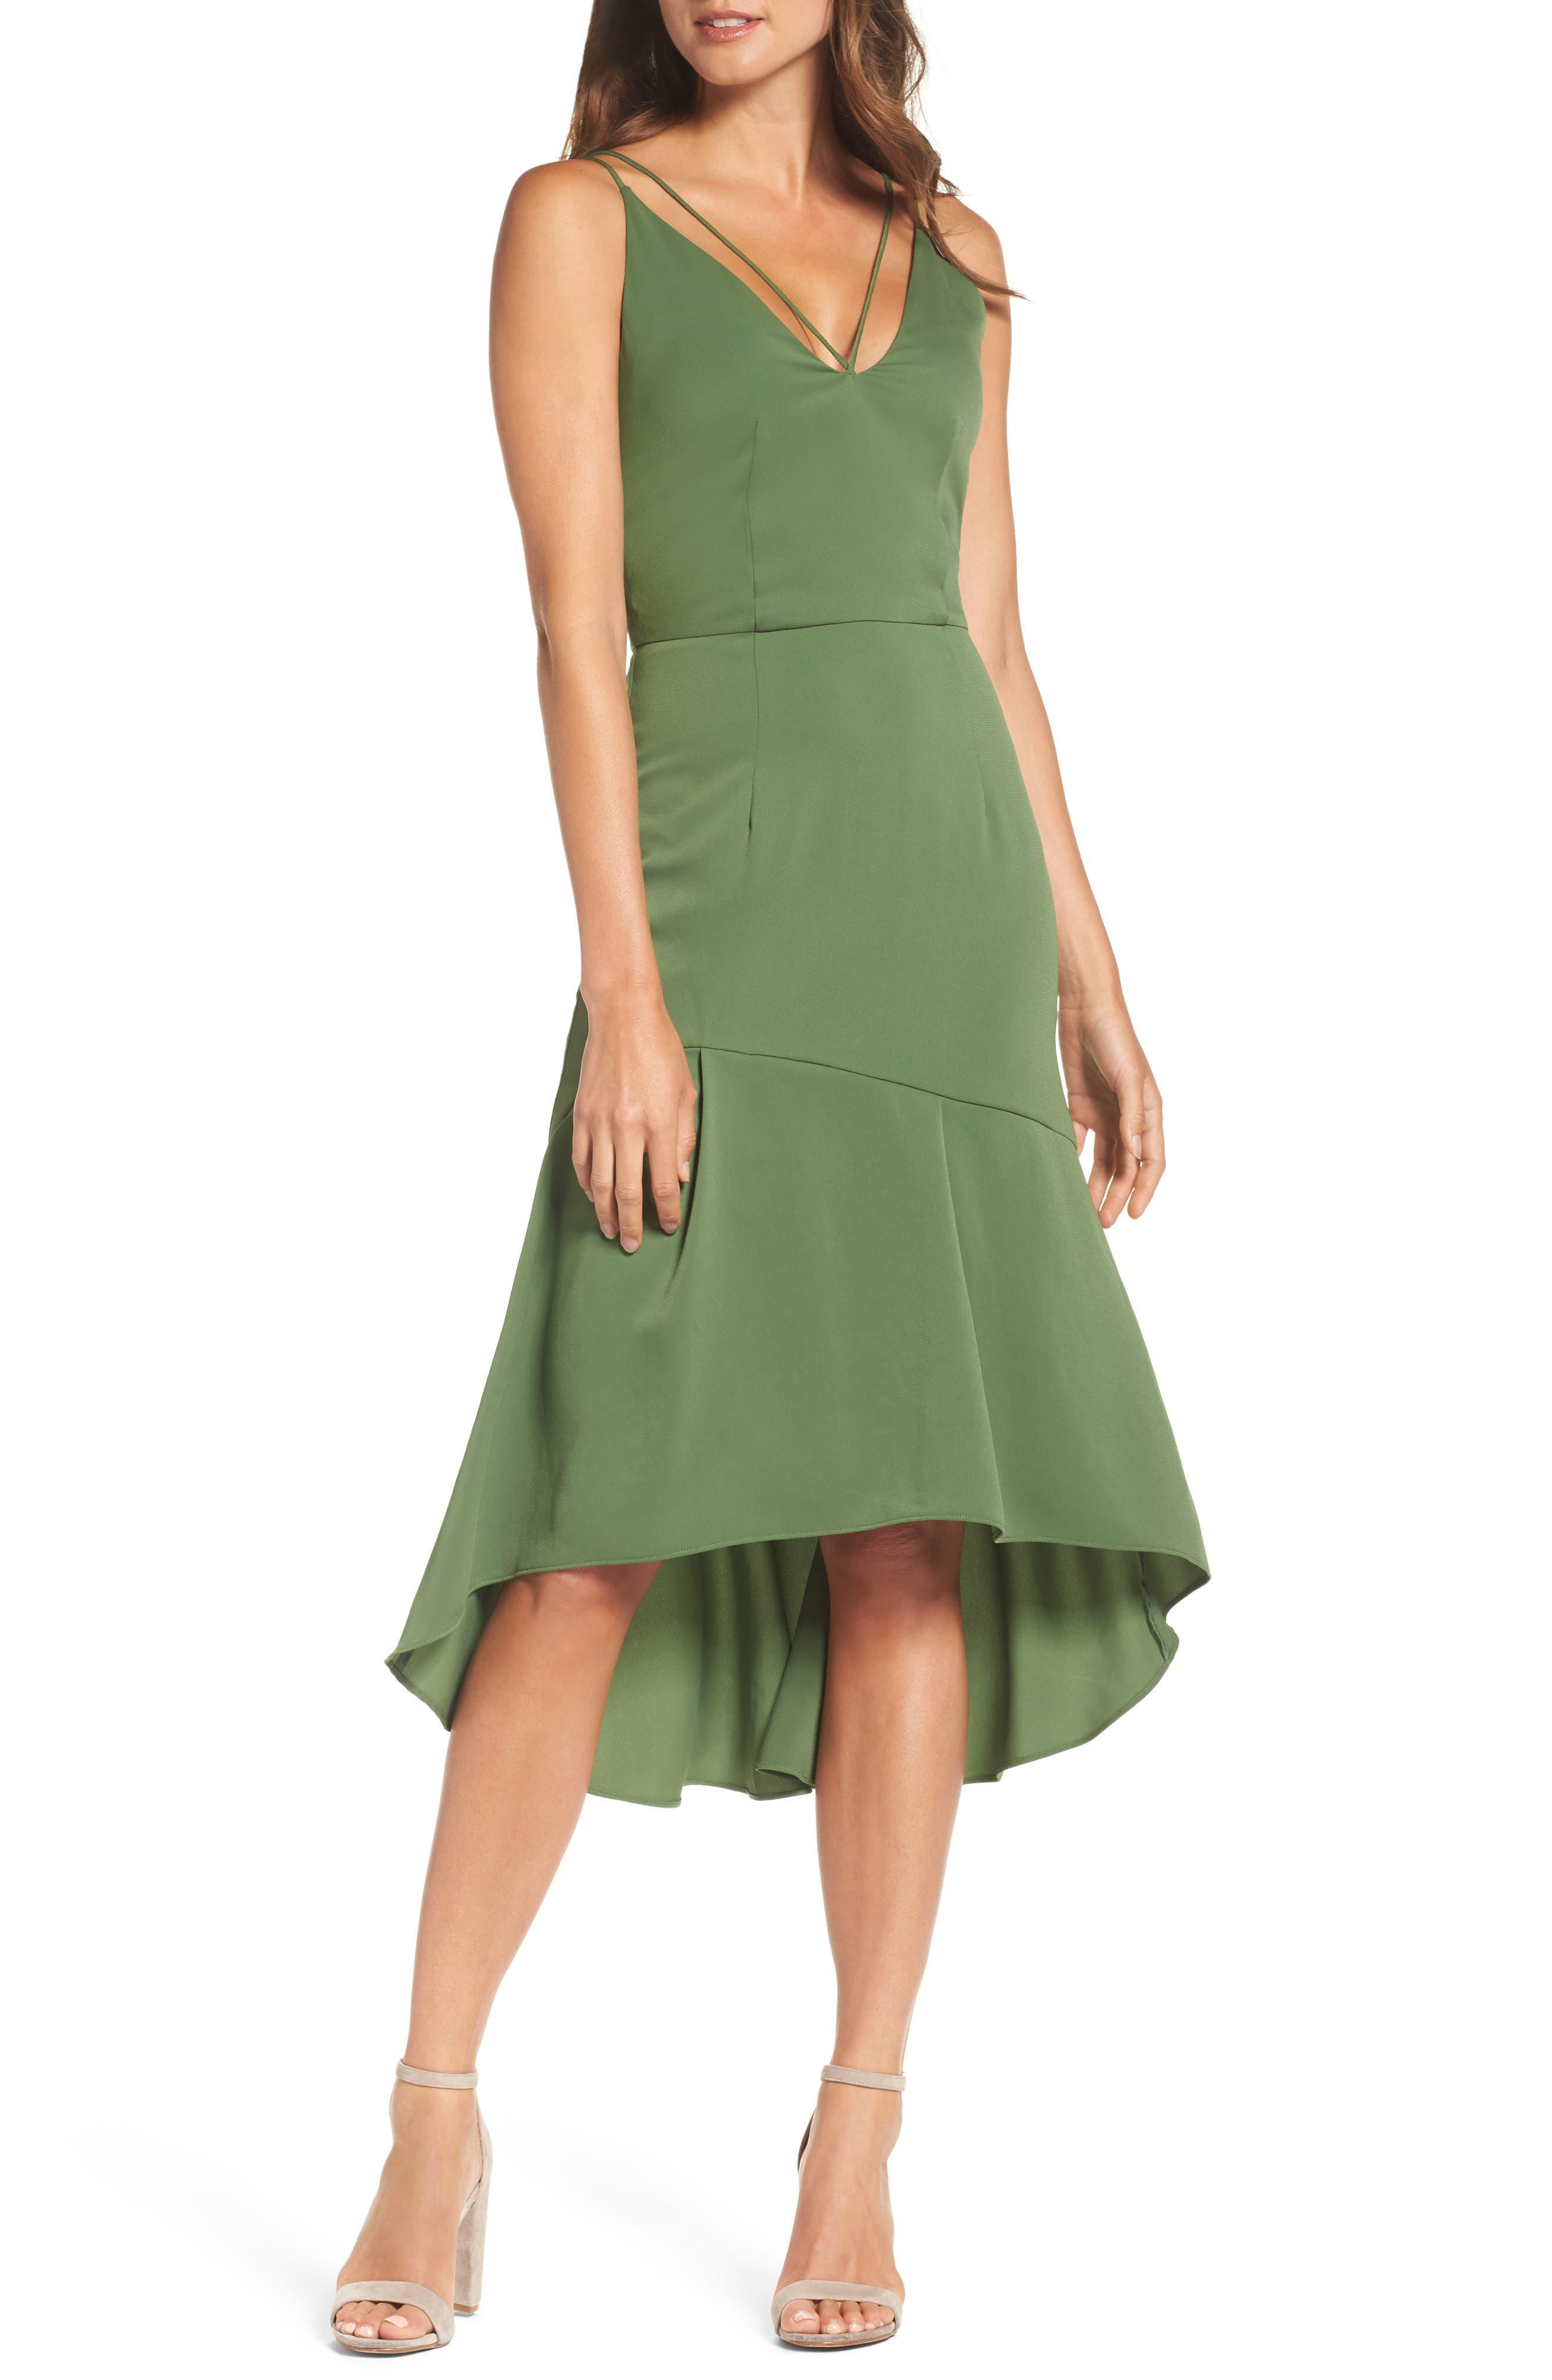 Lovine Midi Dress,                         Main,                         color, Moss Green